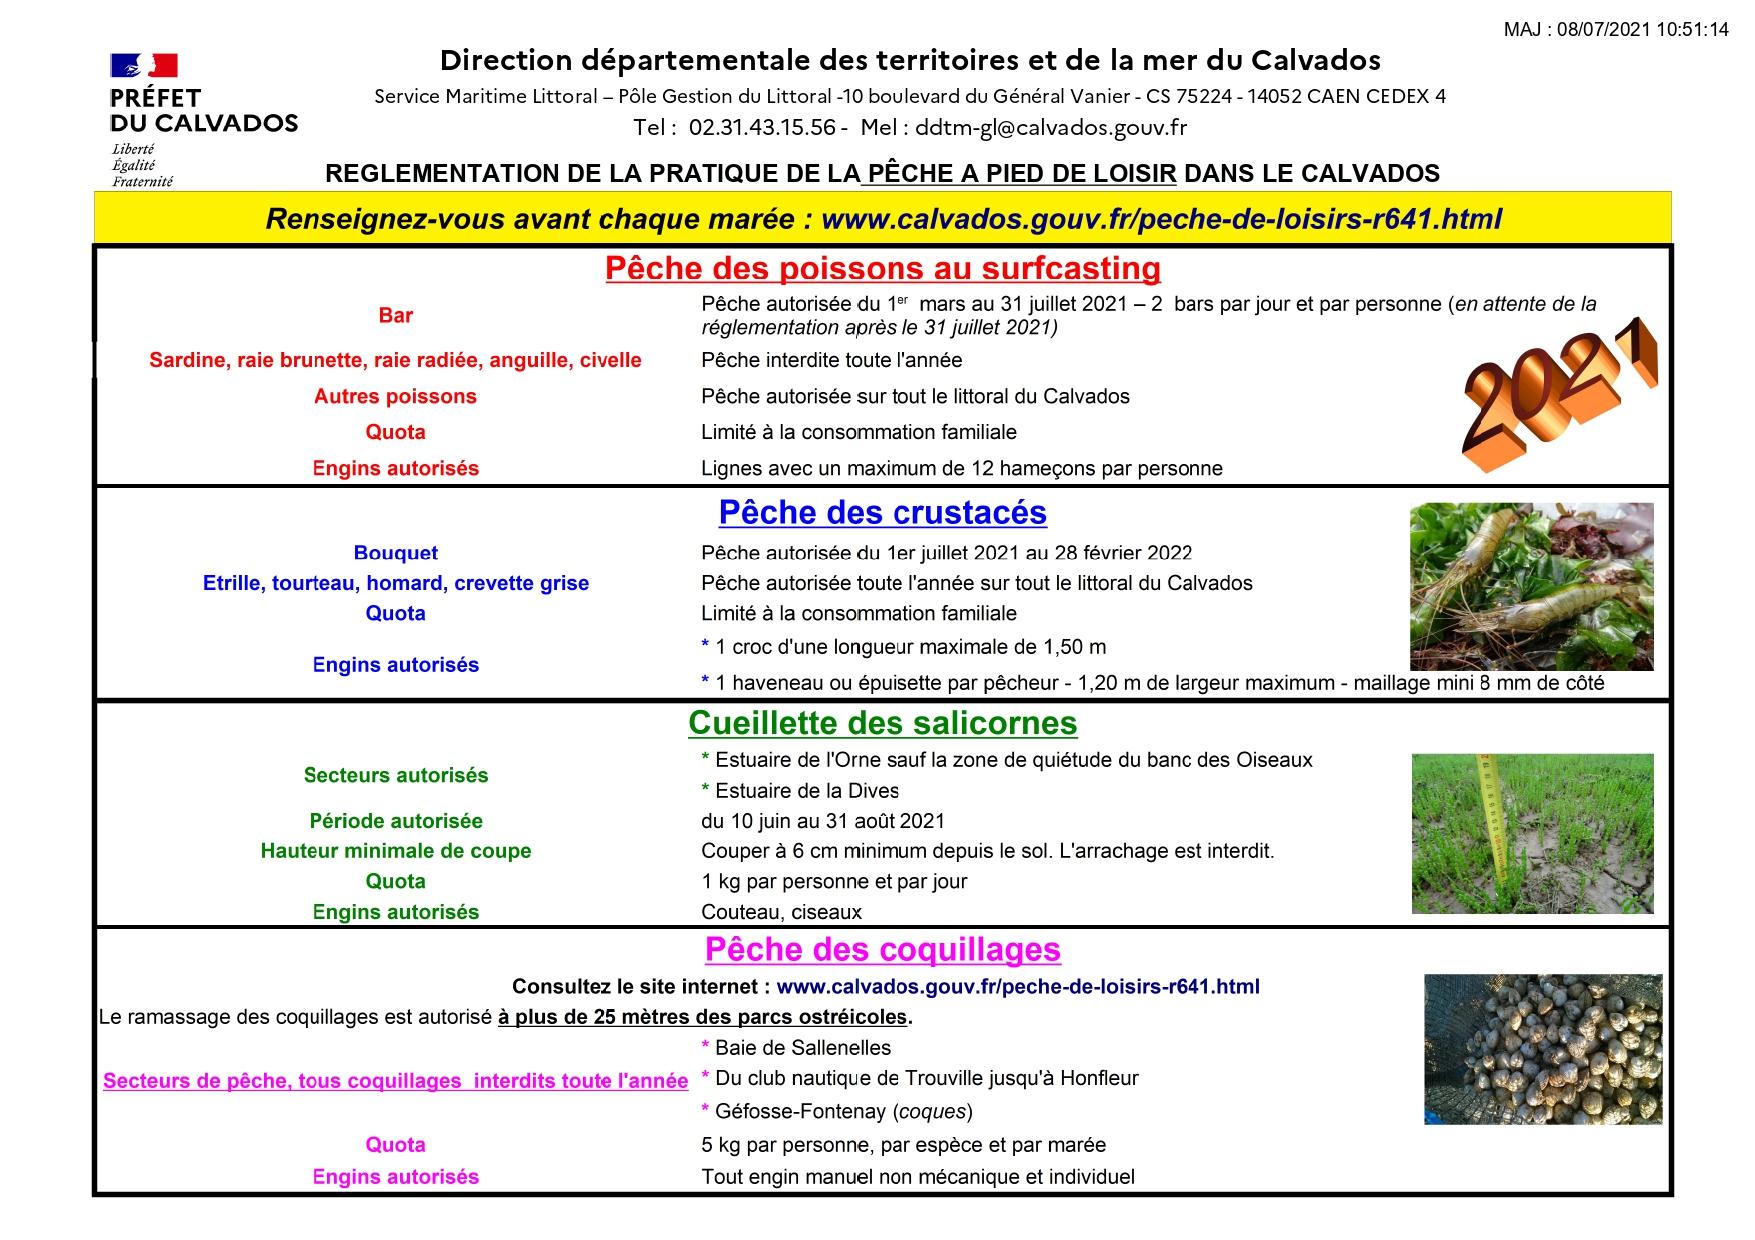 Reglementation-peche_loisir_2021_page-0001.jpg